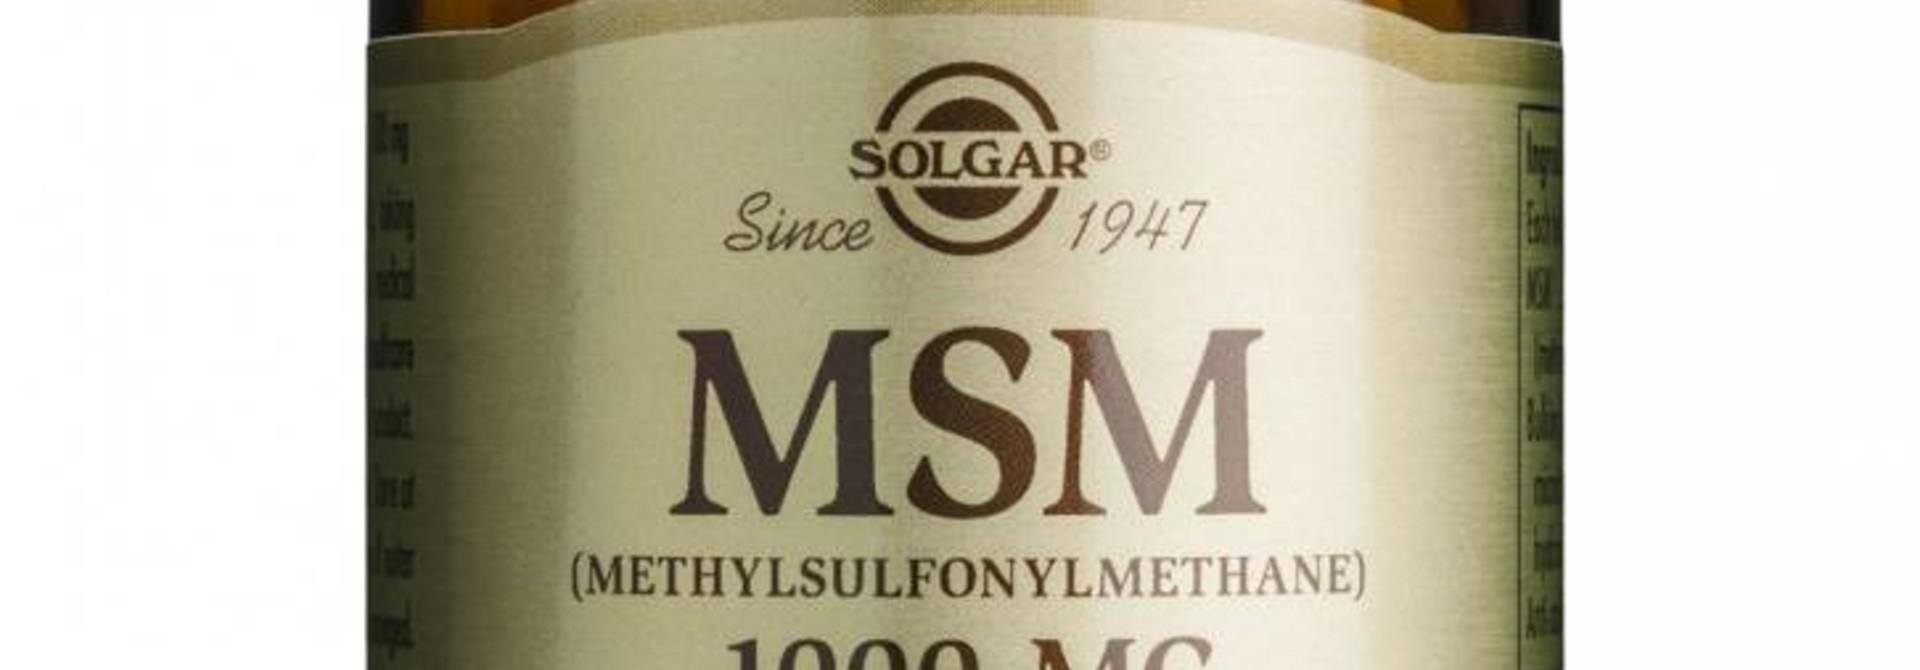 MSM 1000 mg 120 tabletten